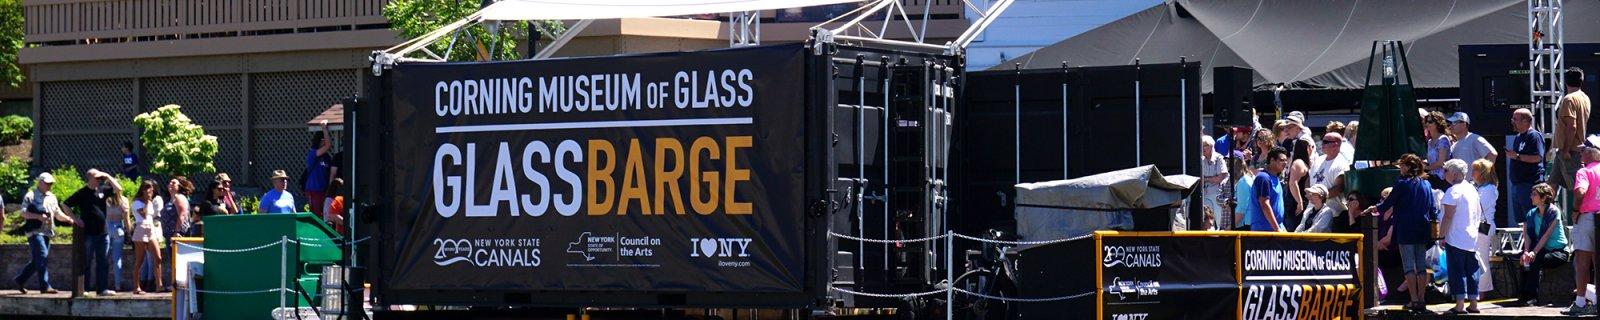 GlassBarge